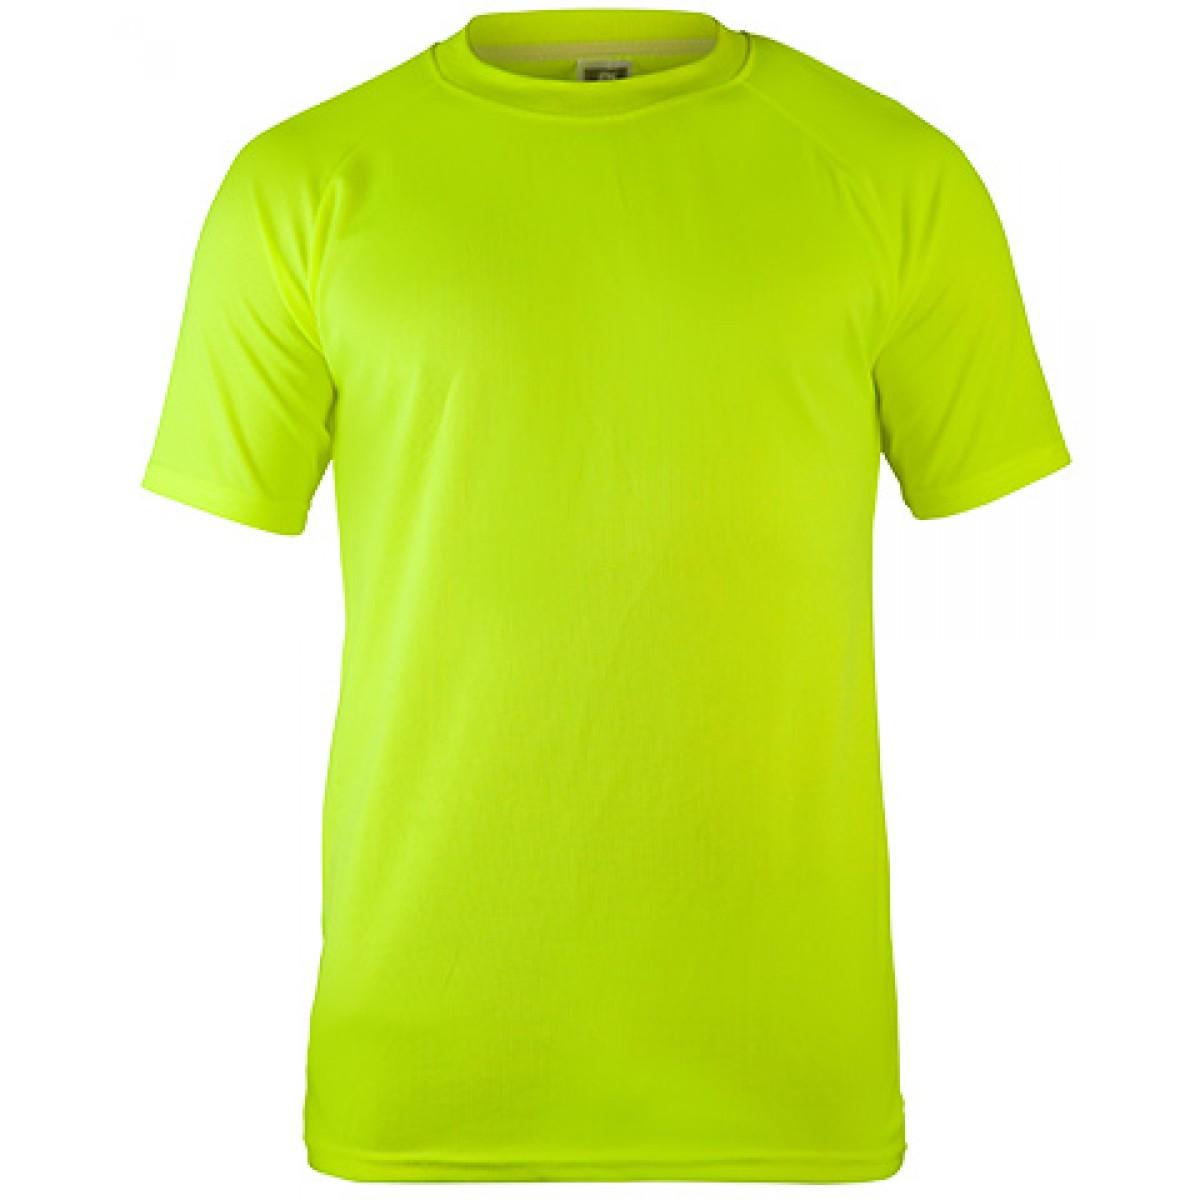 Short Sleeves Mesh Performance T-shirt-Safety Green-M